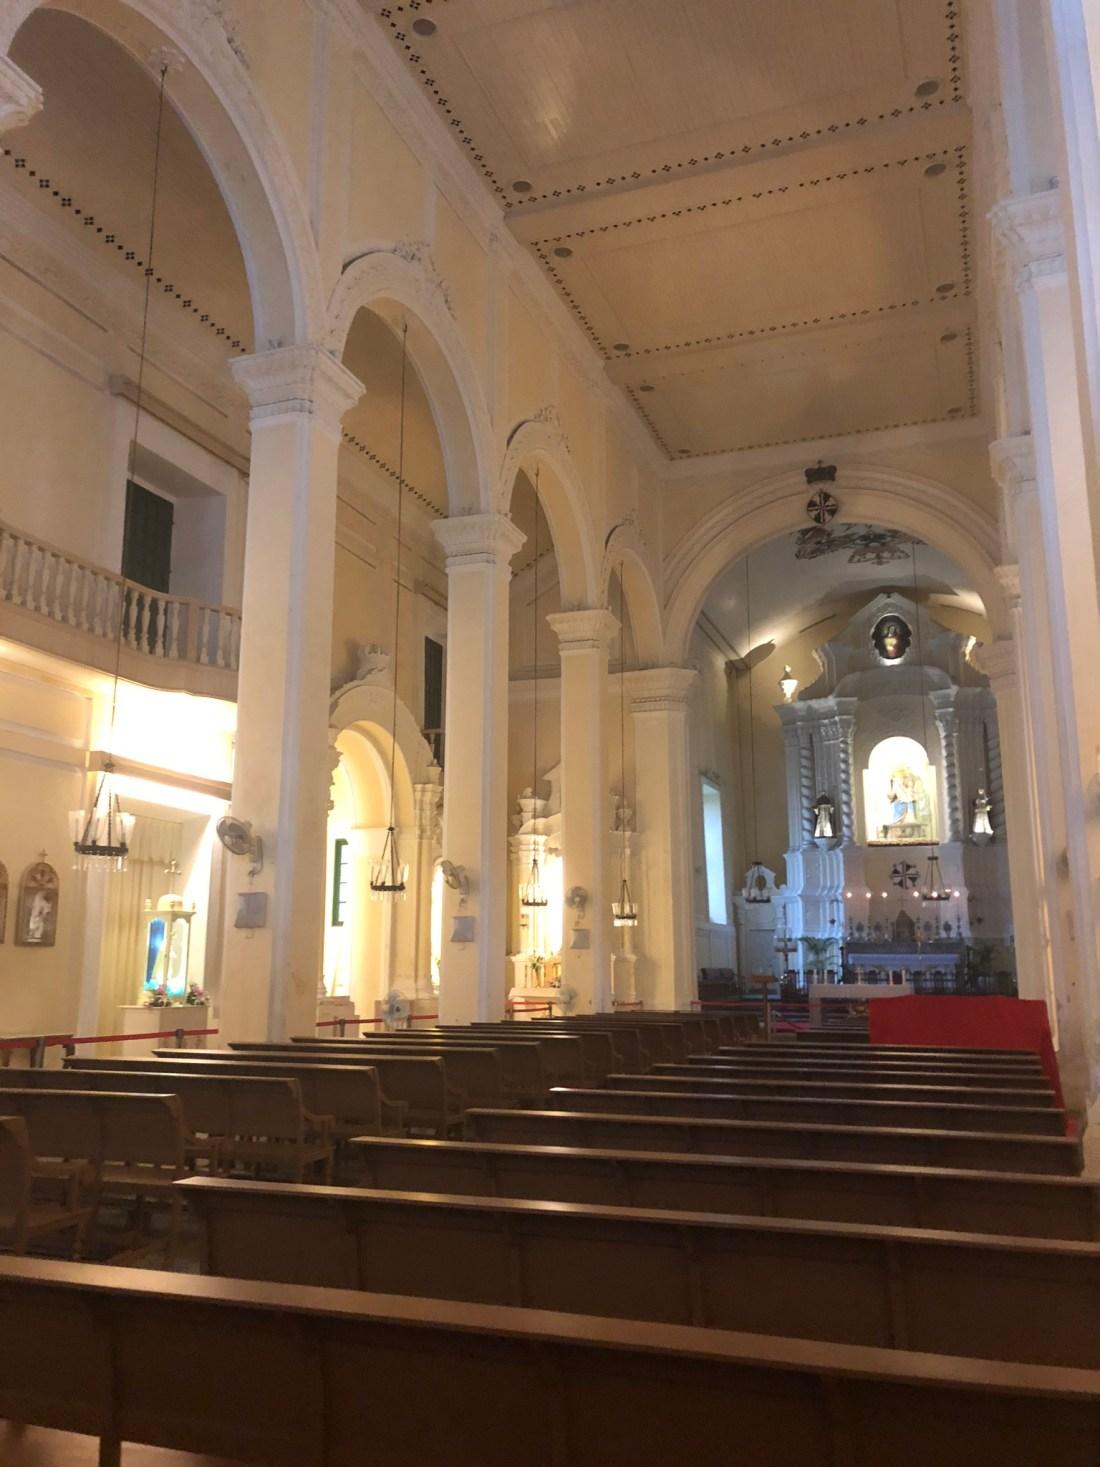 Inside St Dominics Church, Macau